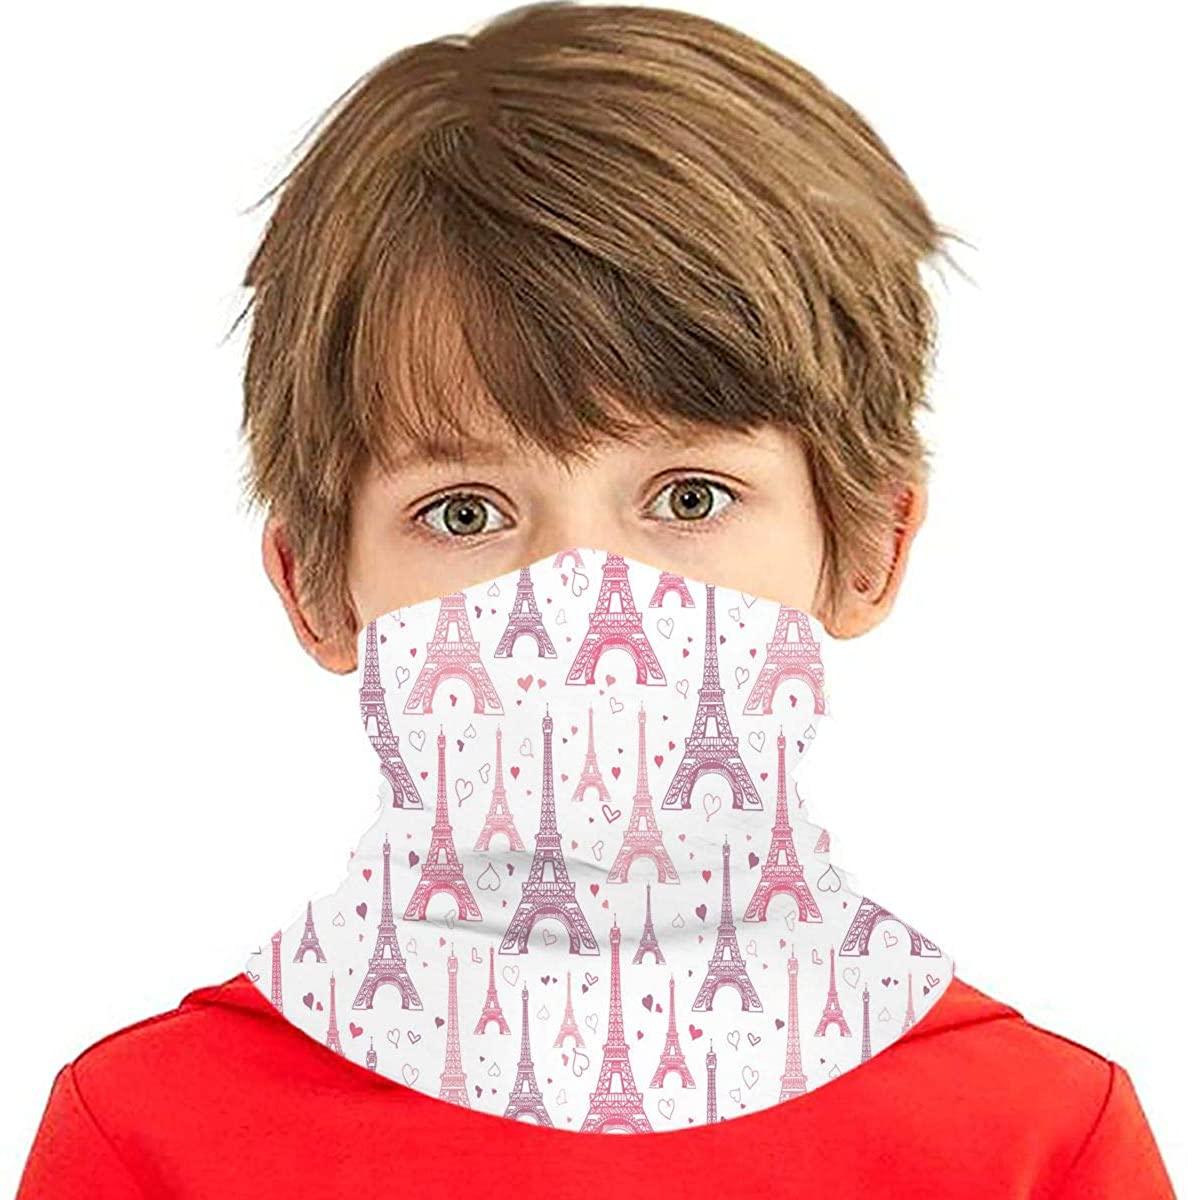 Dujiea Kids Bandanas Face Mask, Pink Eiffel Tower Dust Sun UV Protection Neck Gaiter Multifunctional Balaclava Face Scarf Summer Tube Headband Lightweight for Boys Girls Outdoors